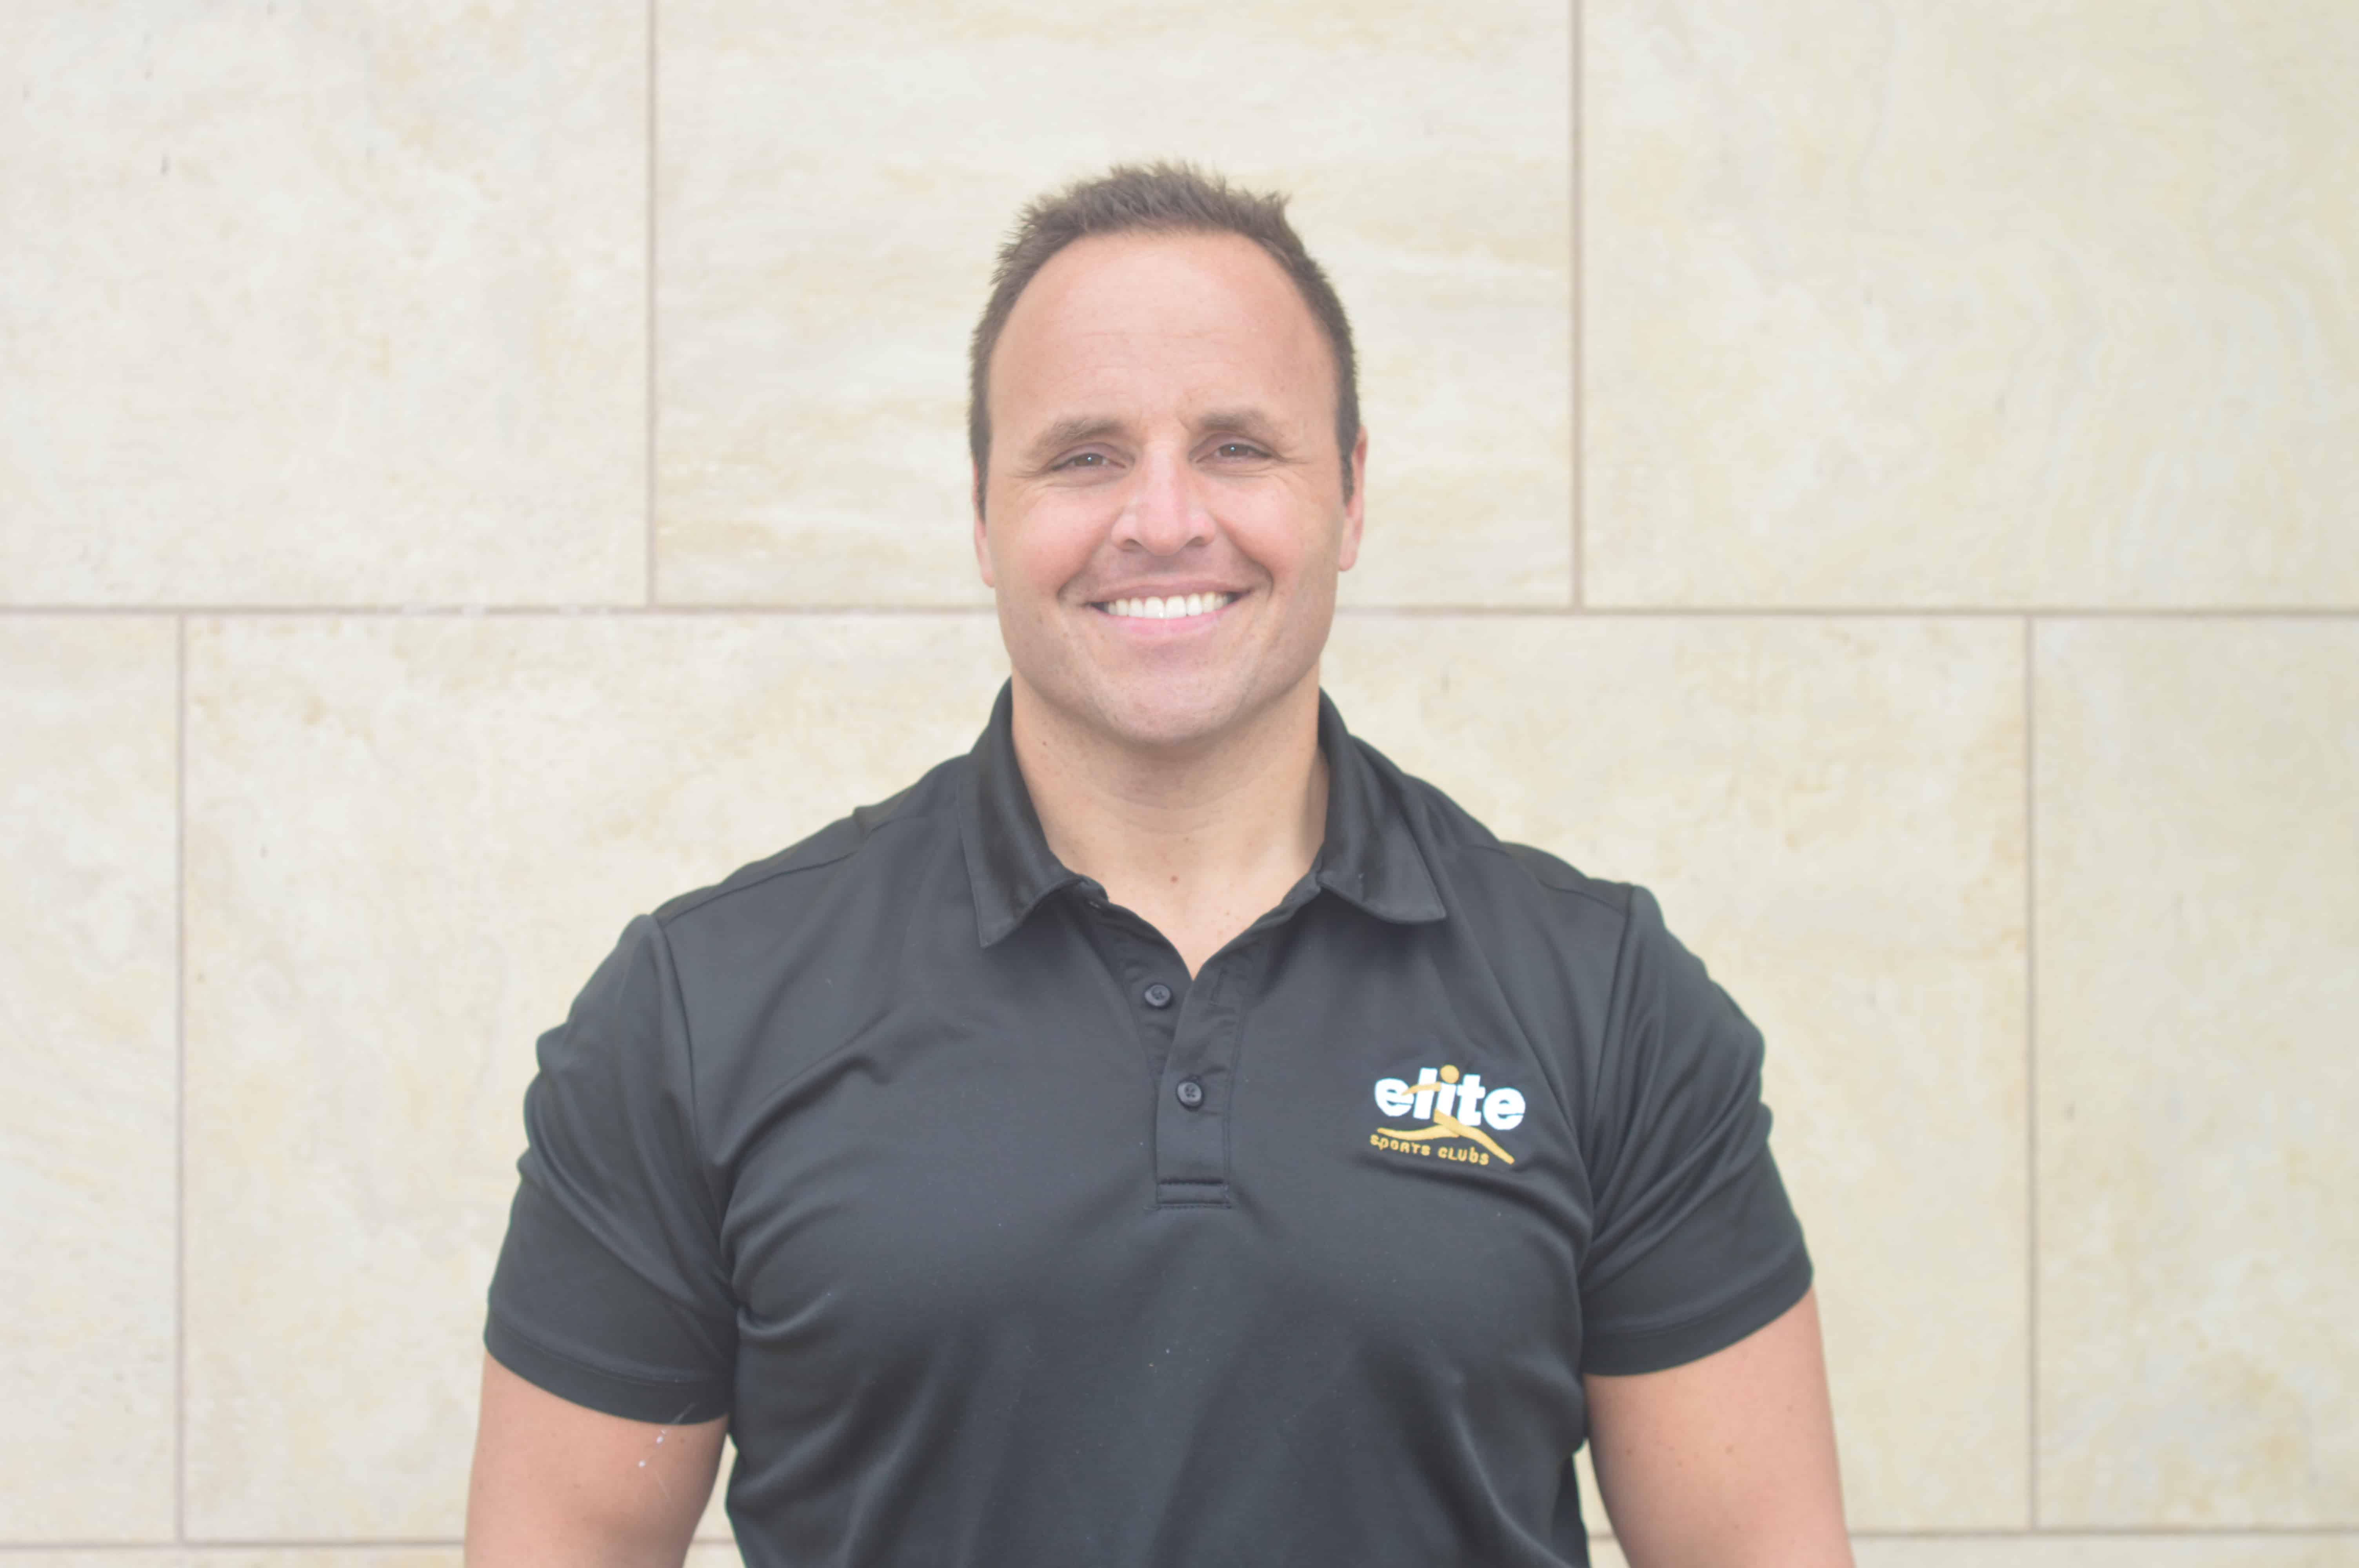 Chris Hajigeorgiou Personal Trainer at Elite Sports Clubs